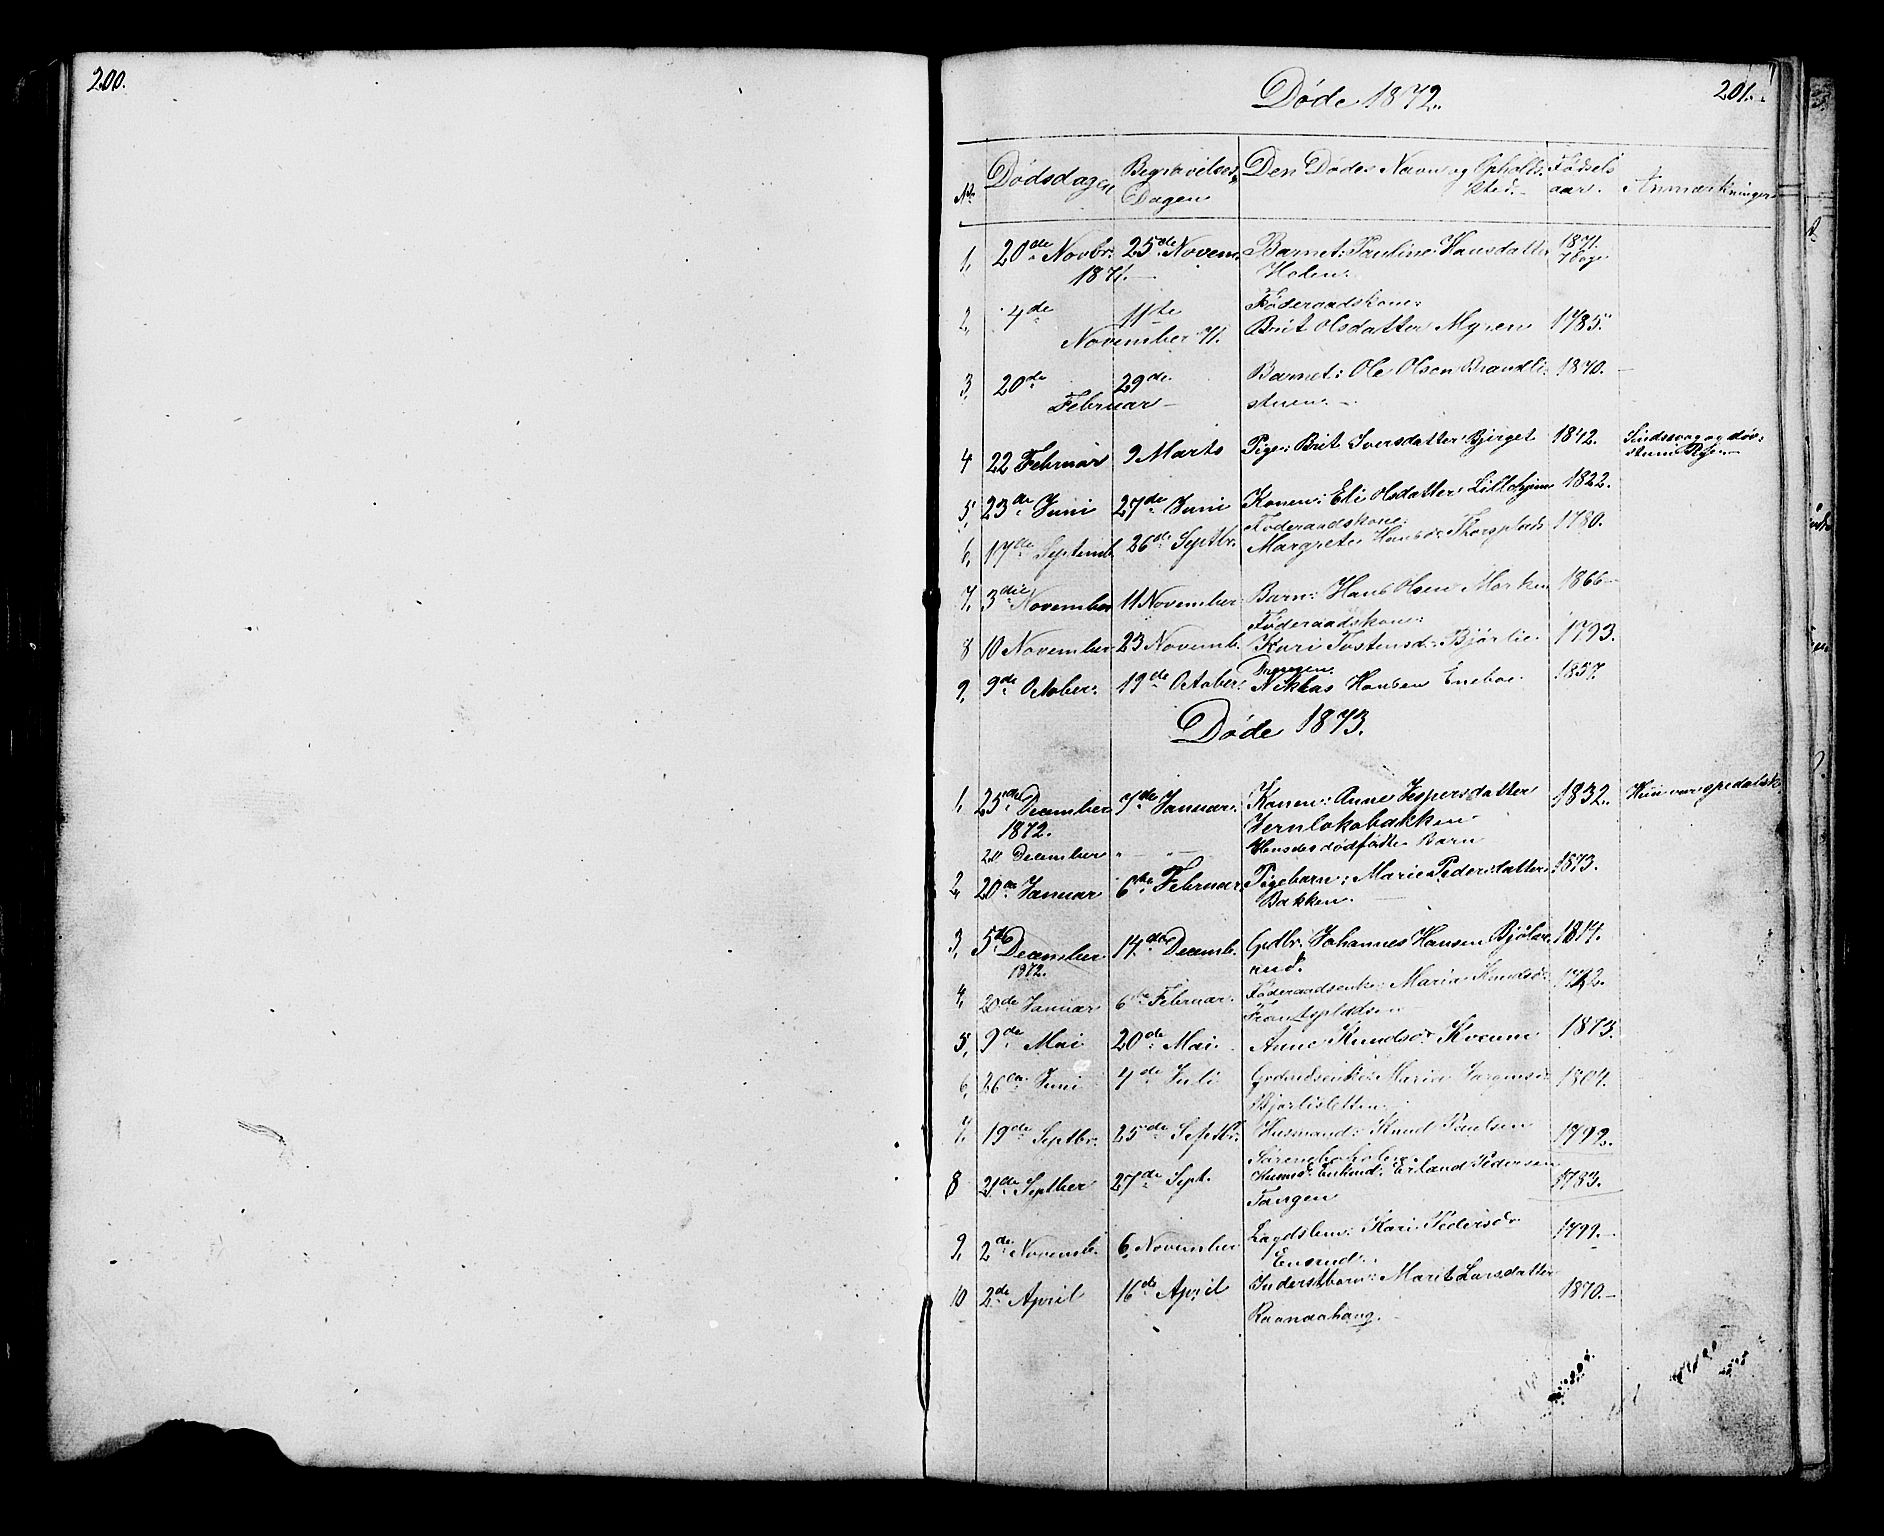 SAH, Lesja prestekontor, Klokkerbok nr. 6, 1871-1904, s. 200-201